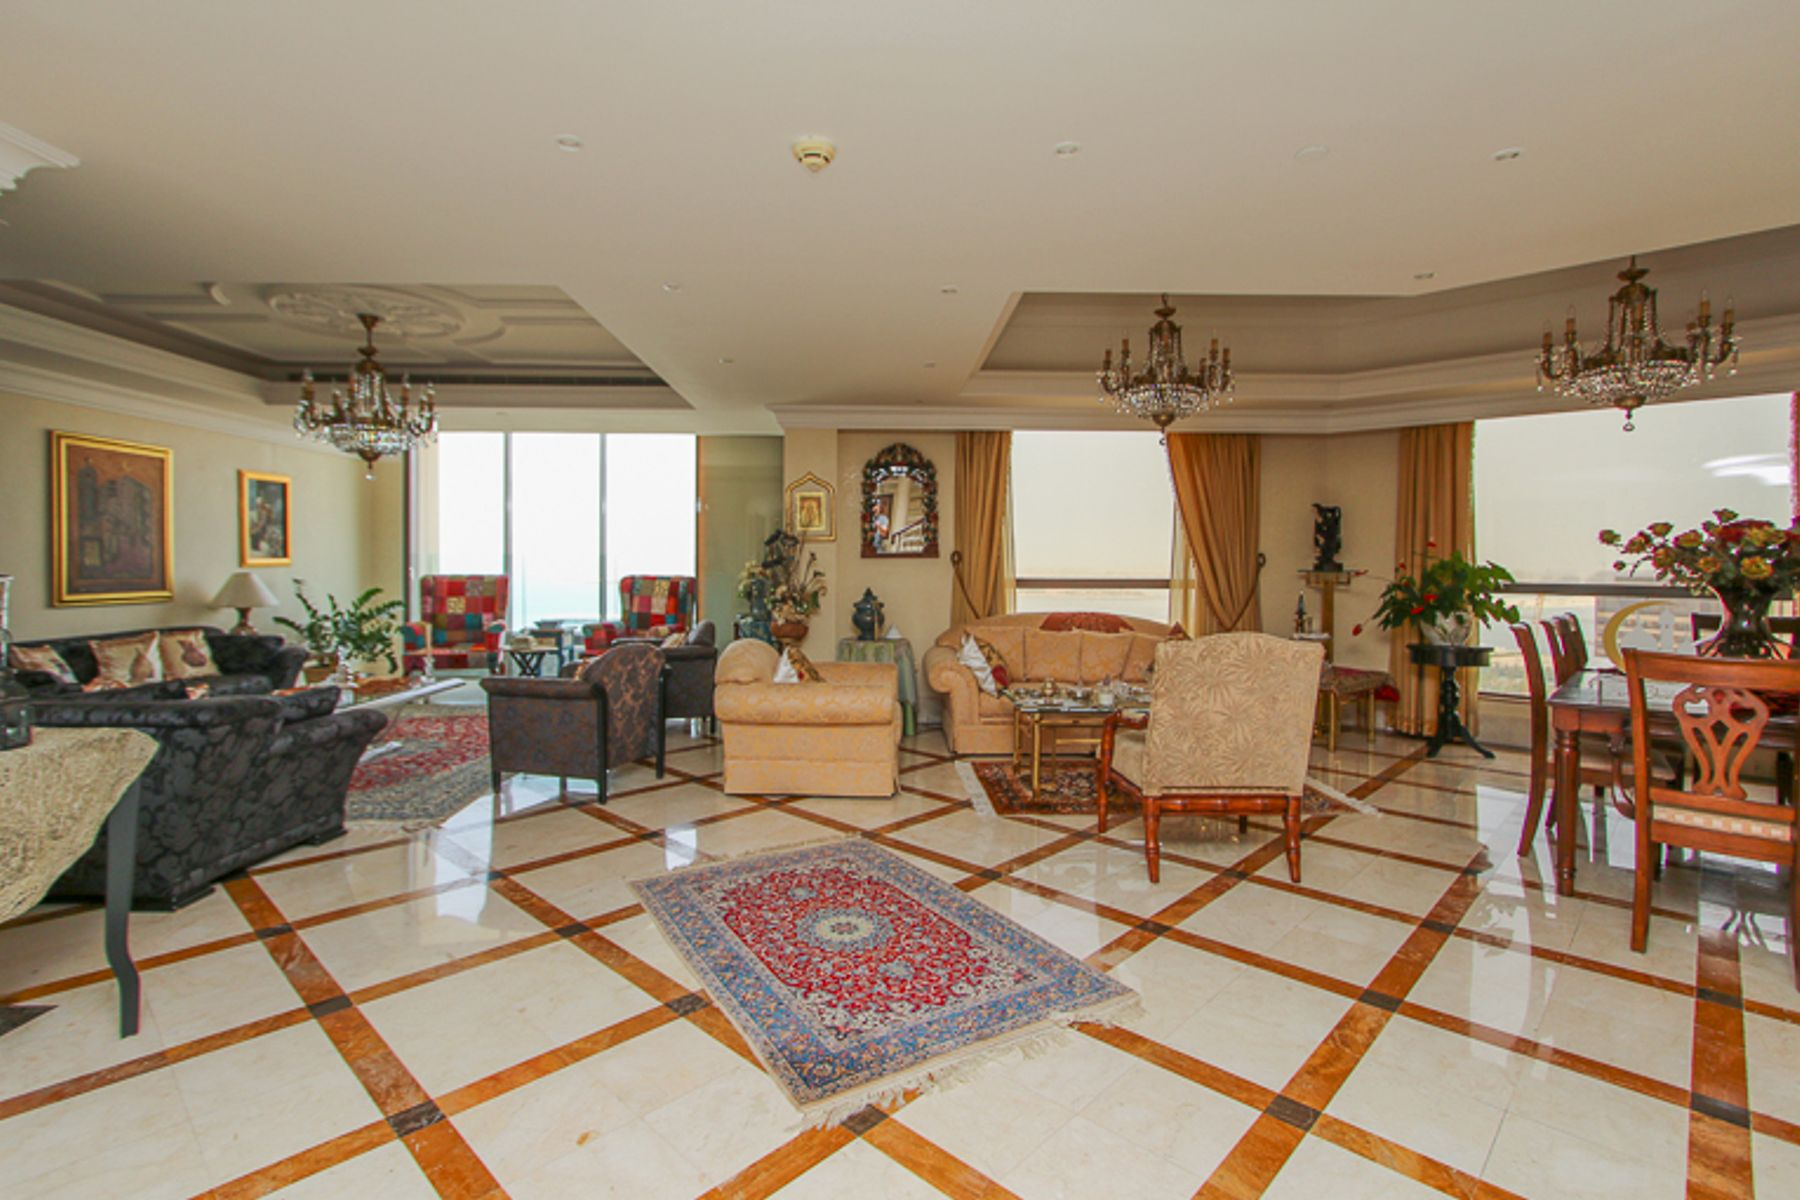 Duplex for Sale in Sadaf 7 - Jumeirah Beach Residence